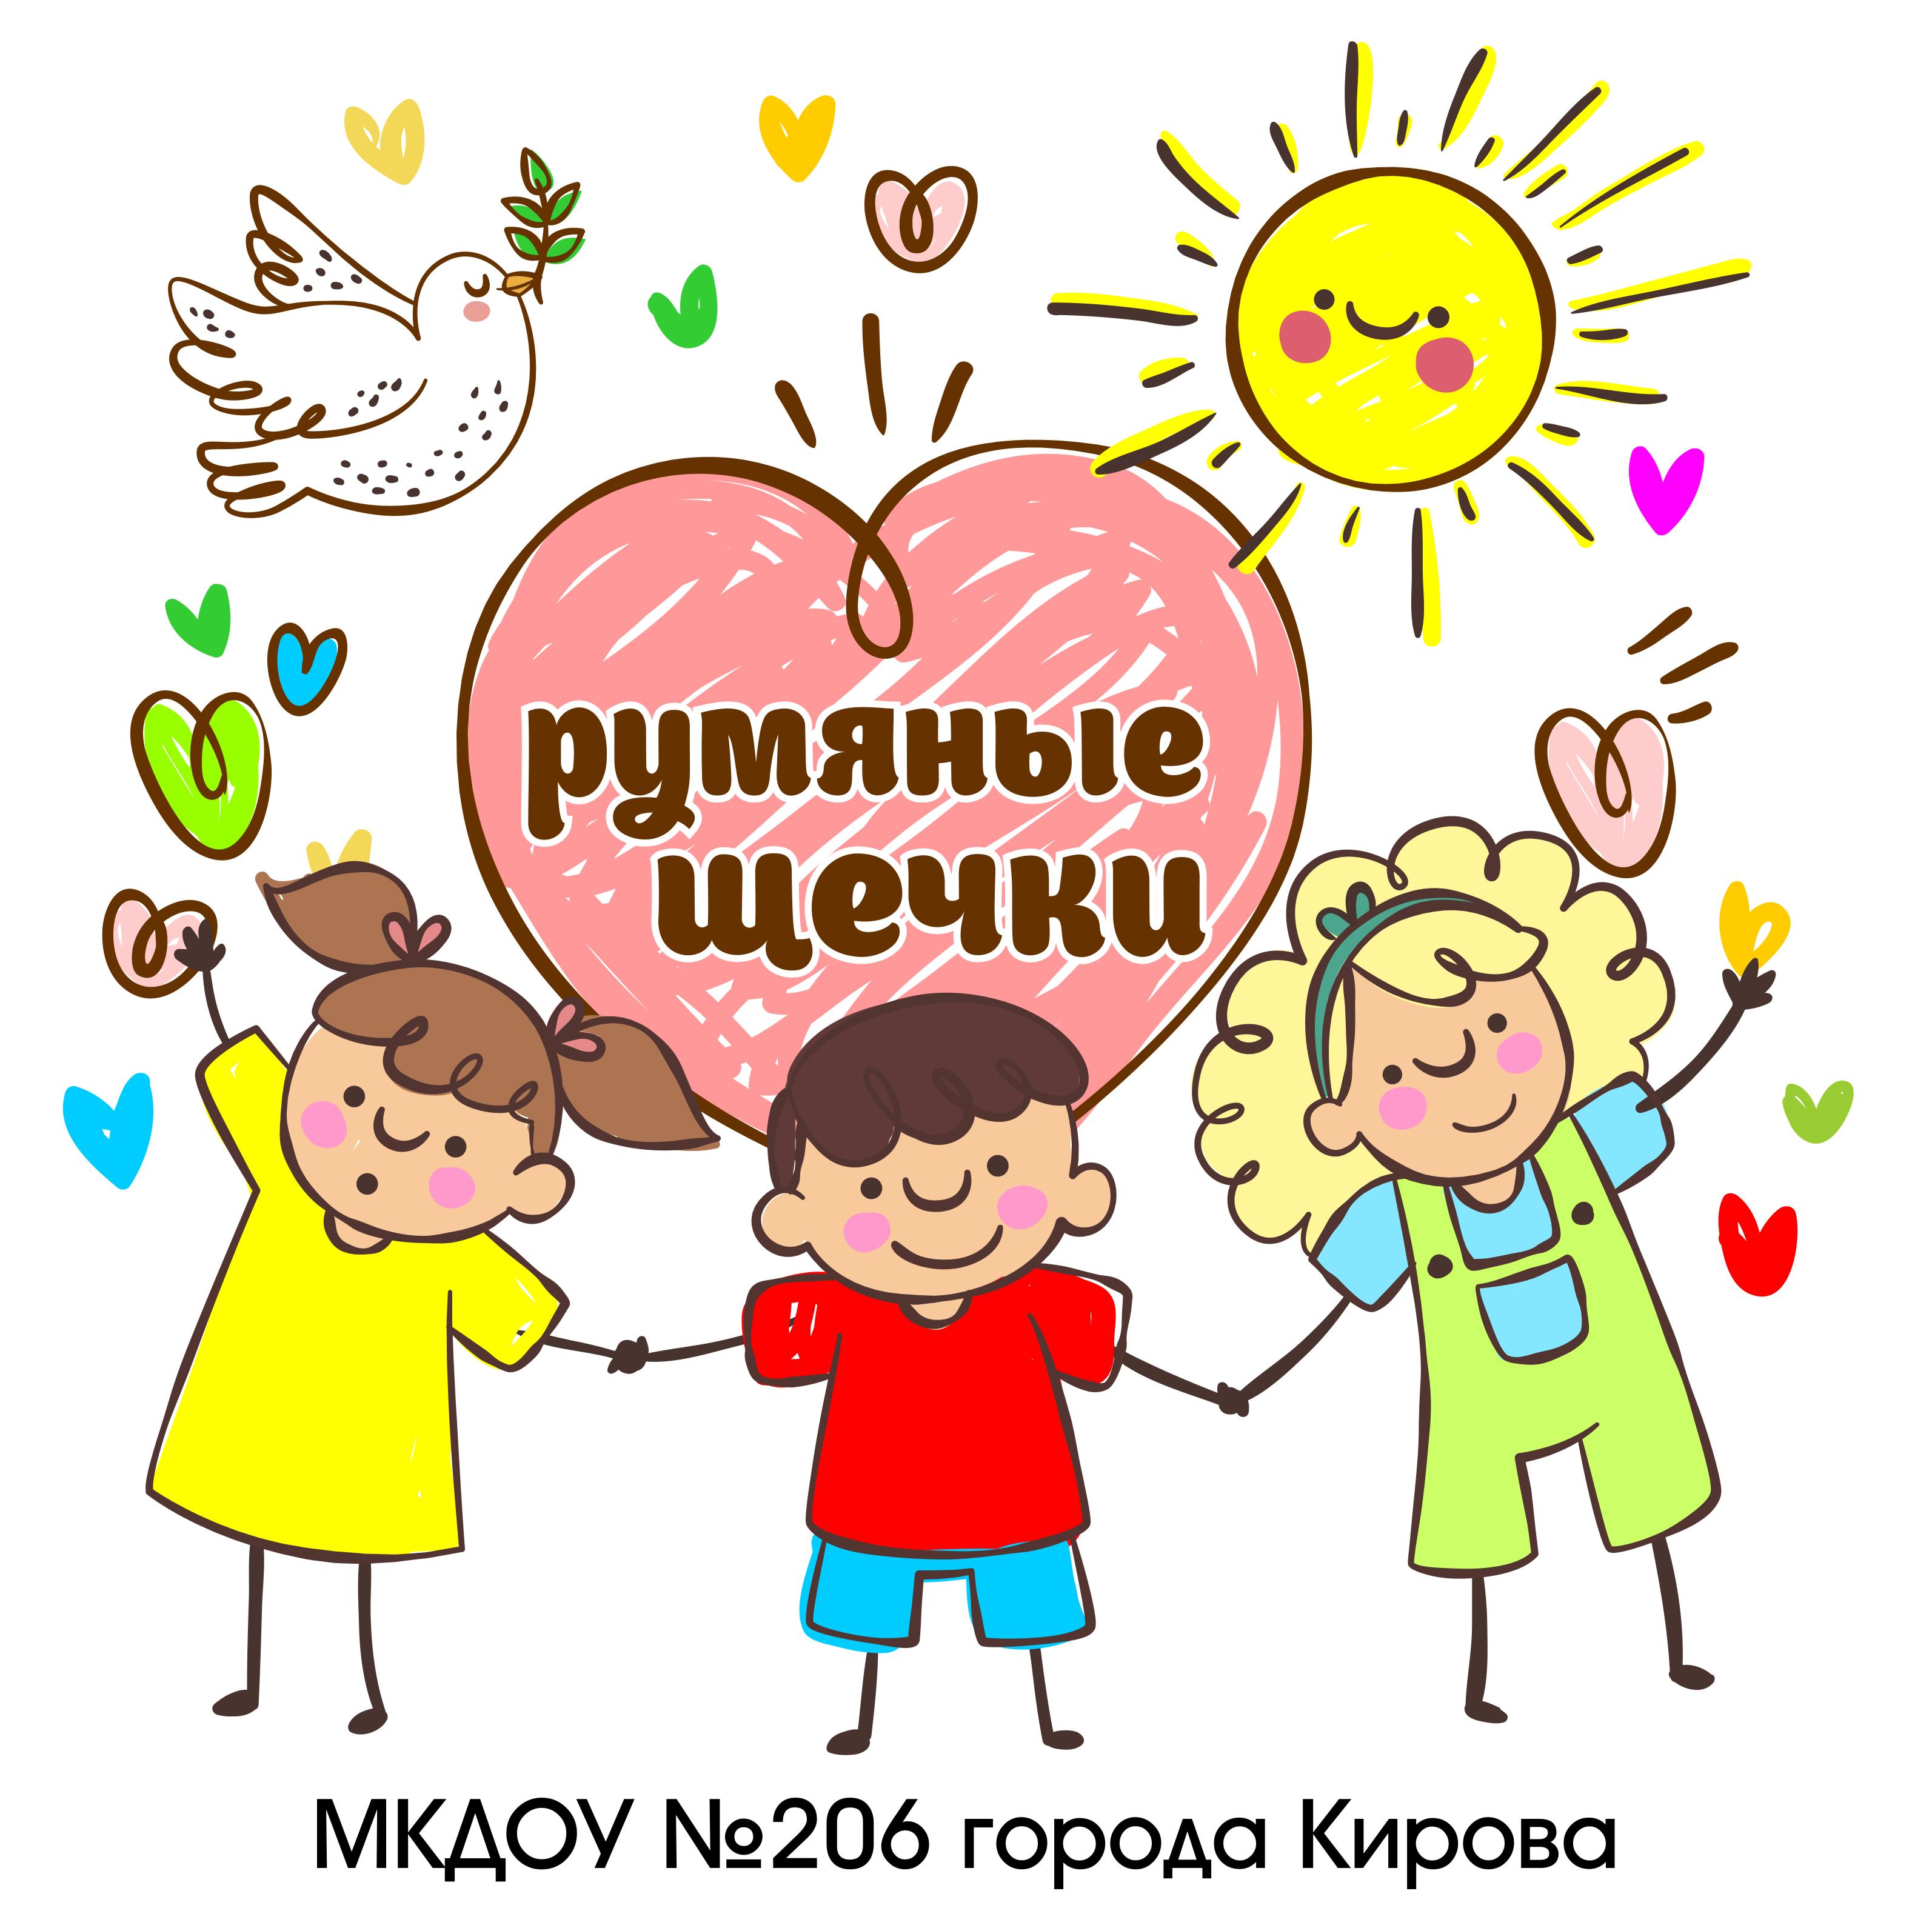 МКДОУ №206 города Кирова